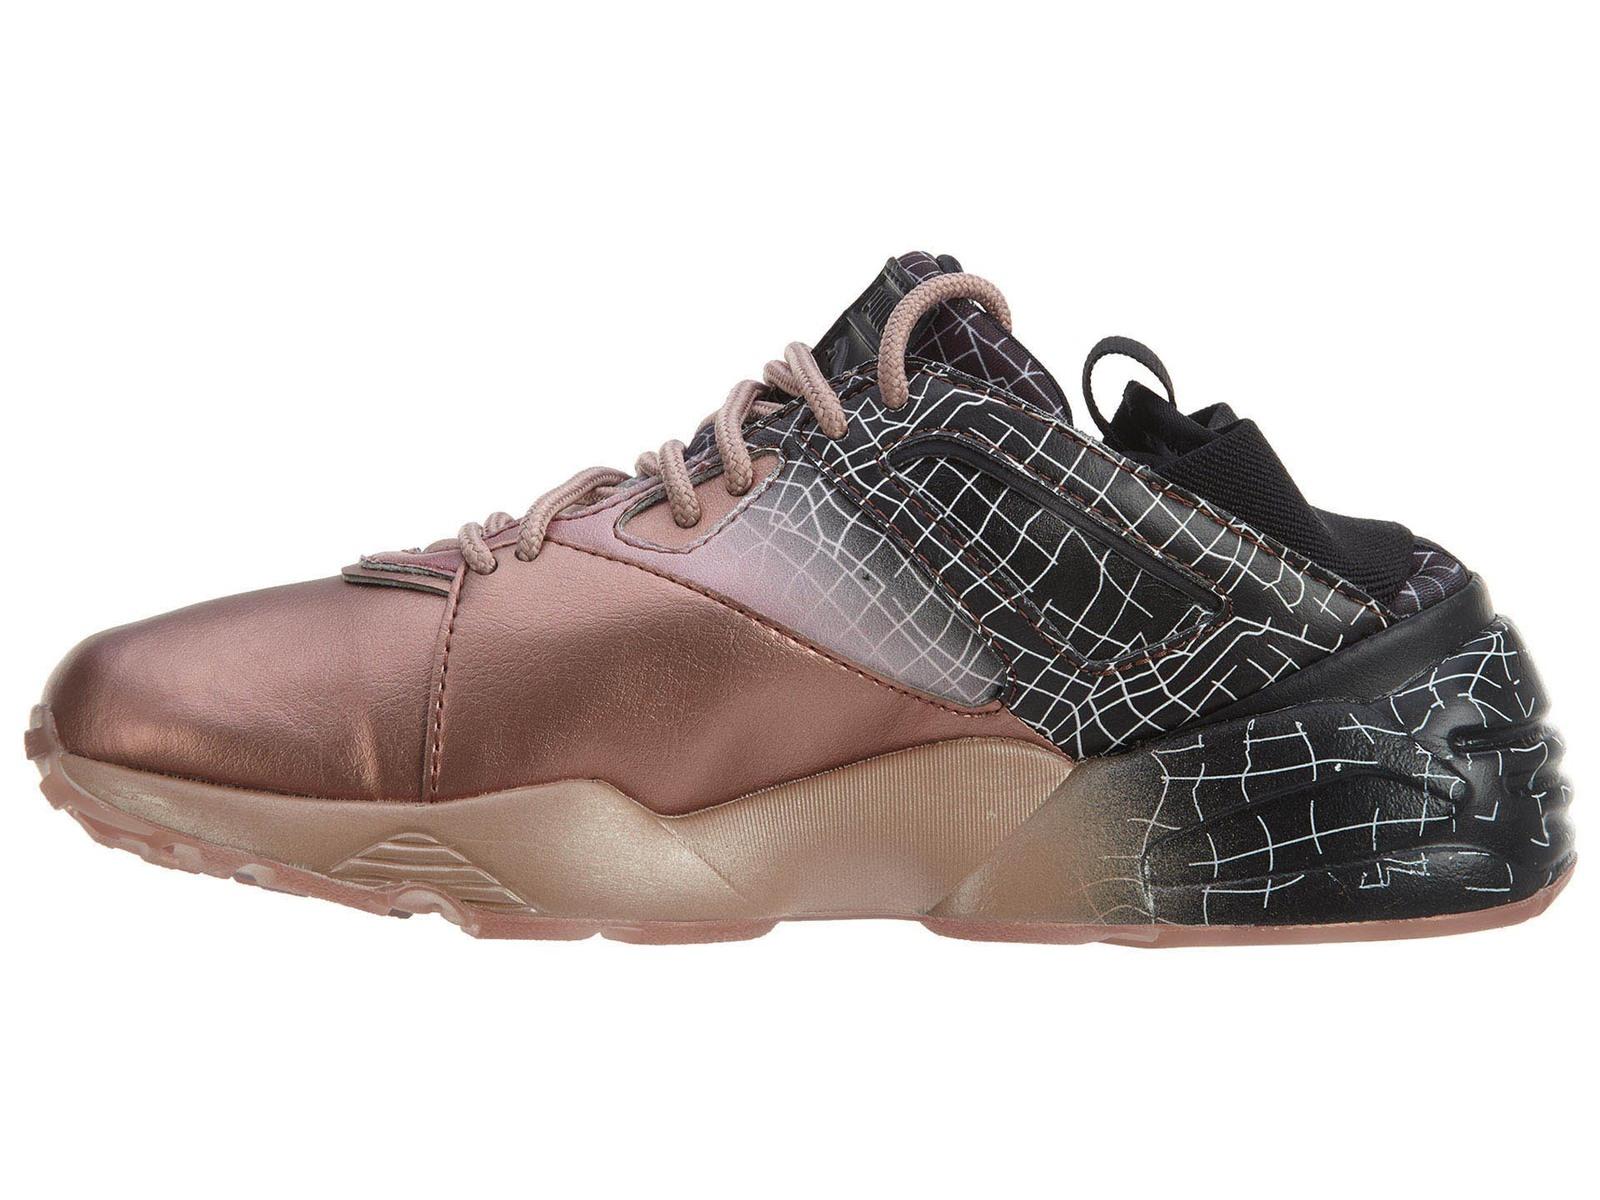 035cbb6c97903e ... Economy Womens Shoes PUMA Rose GoldPuma Black Bog Sock RG 8955141  larger  cute fd8d2 06aa9 ... Puma Puma Bog Sock RG Cross Trainer Shoe Womens  Style ...